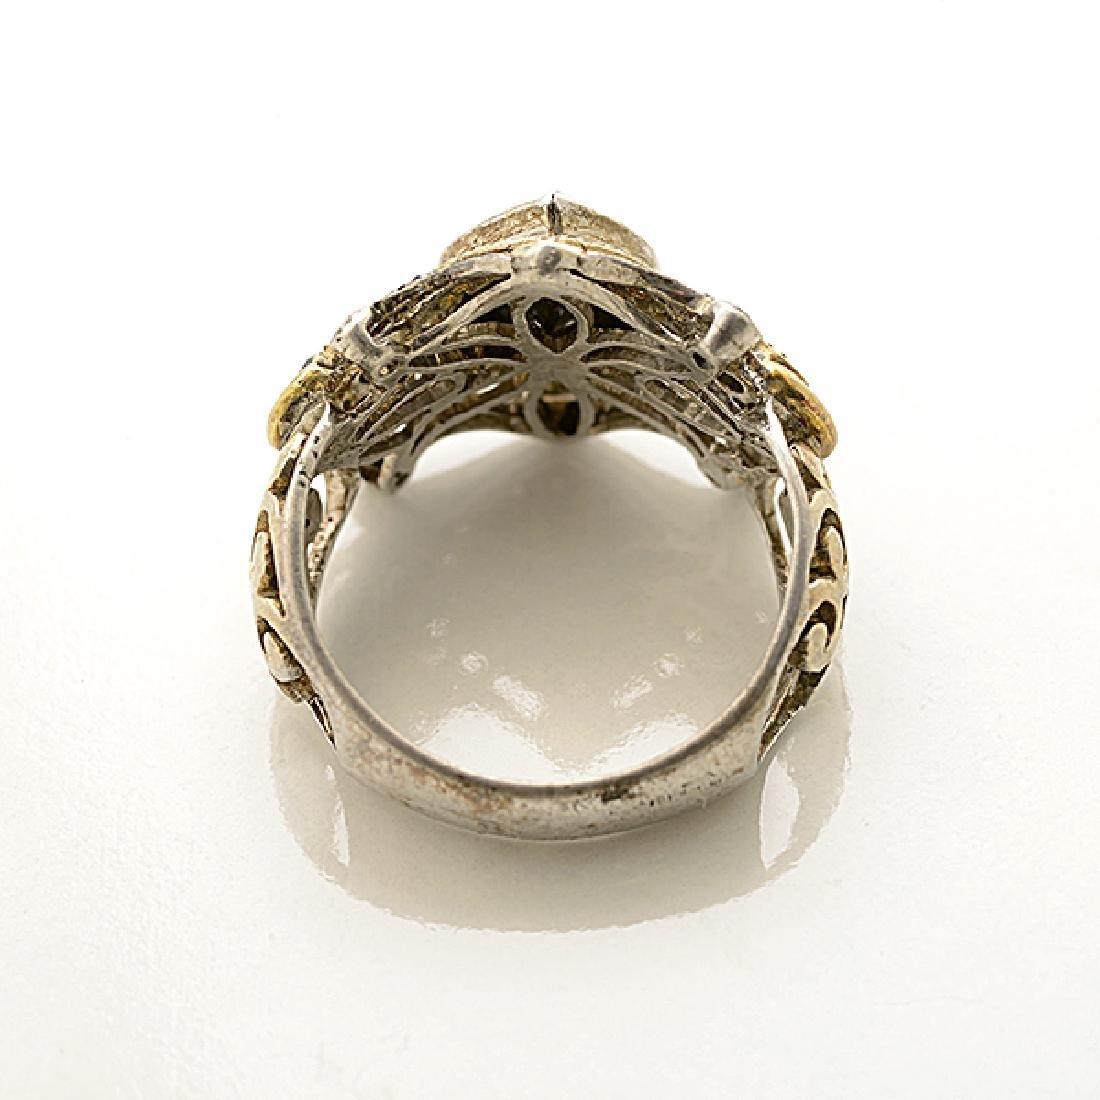 Black Diamond, Diamond, Sterling Silver, Gold Ring. - 3